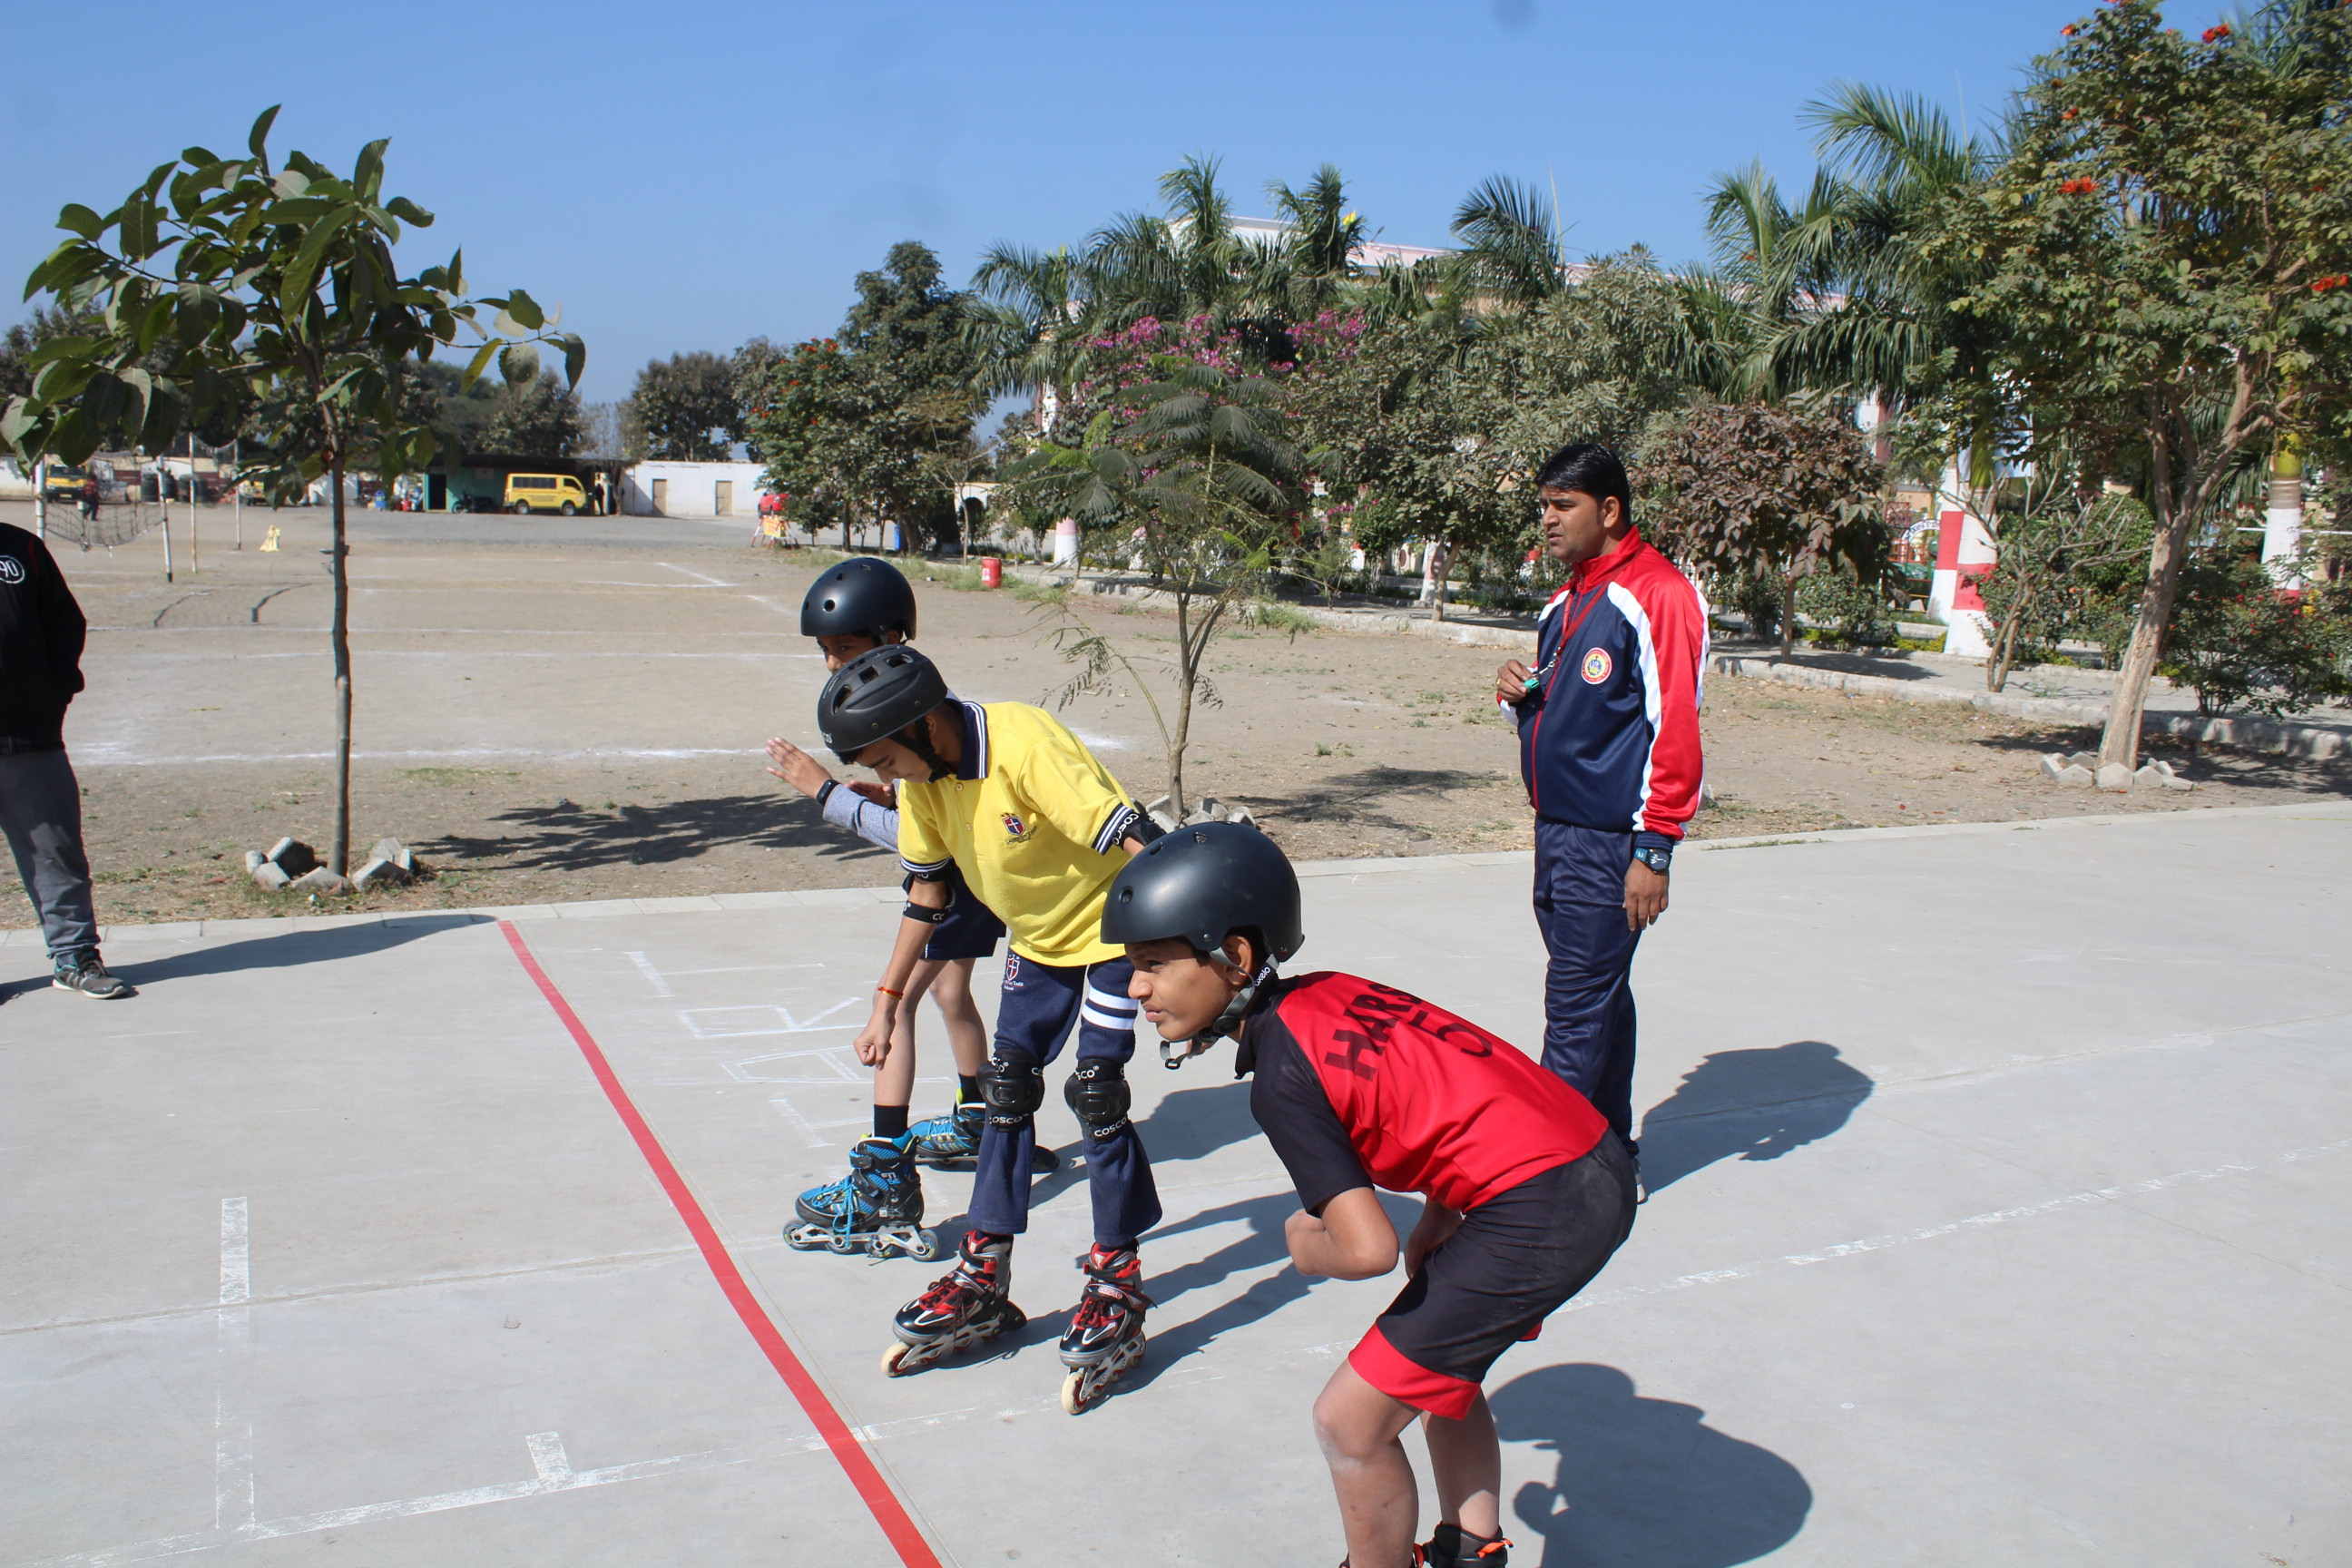 All India Roller Skating Championship